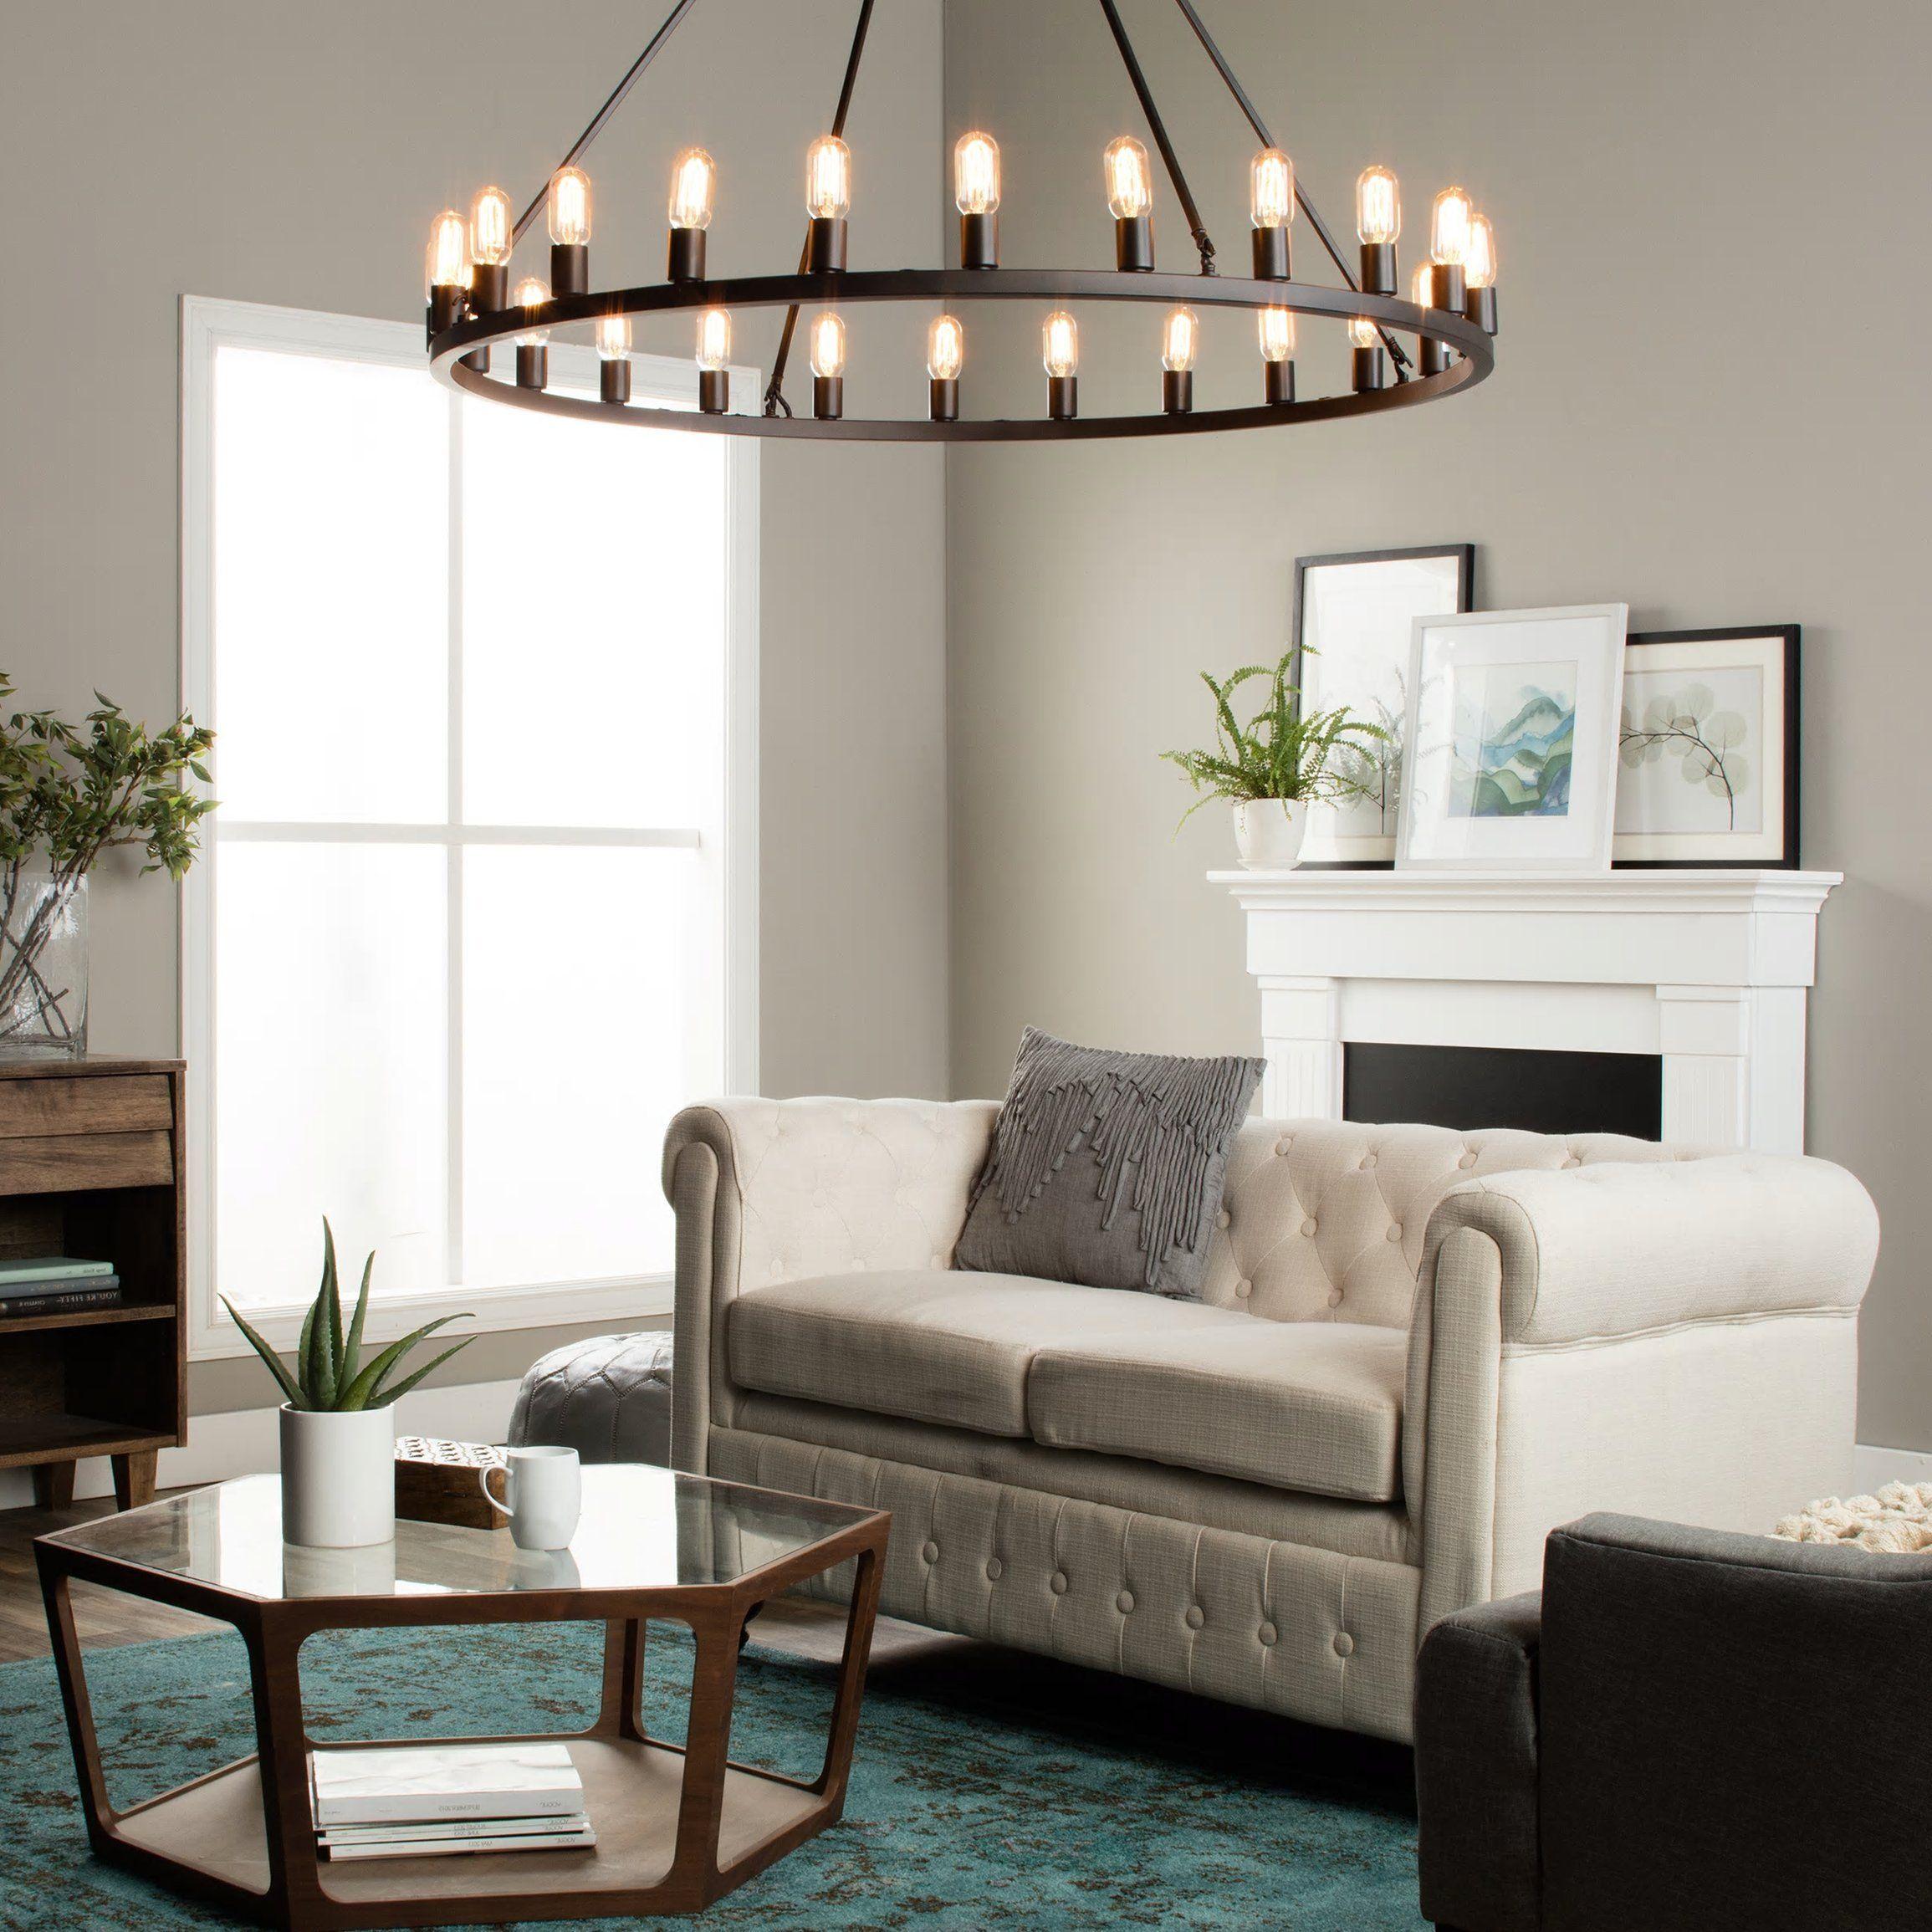 Rustic Chandelier Centerpiece With Bulbs For Modern Farmhouse